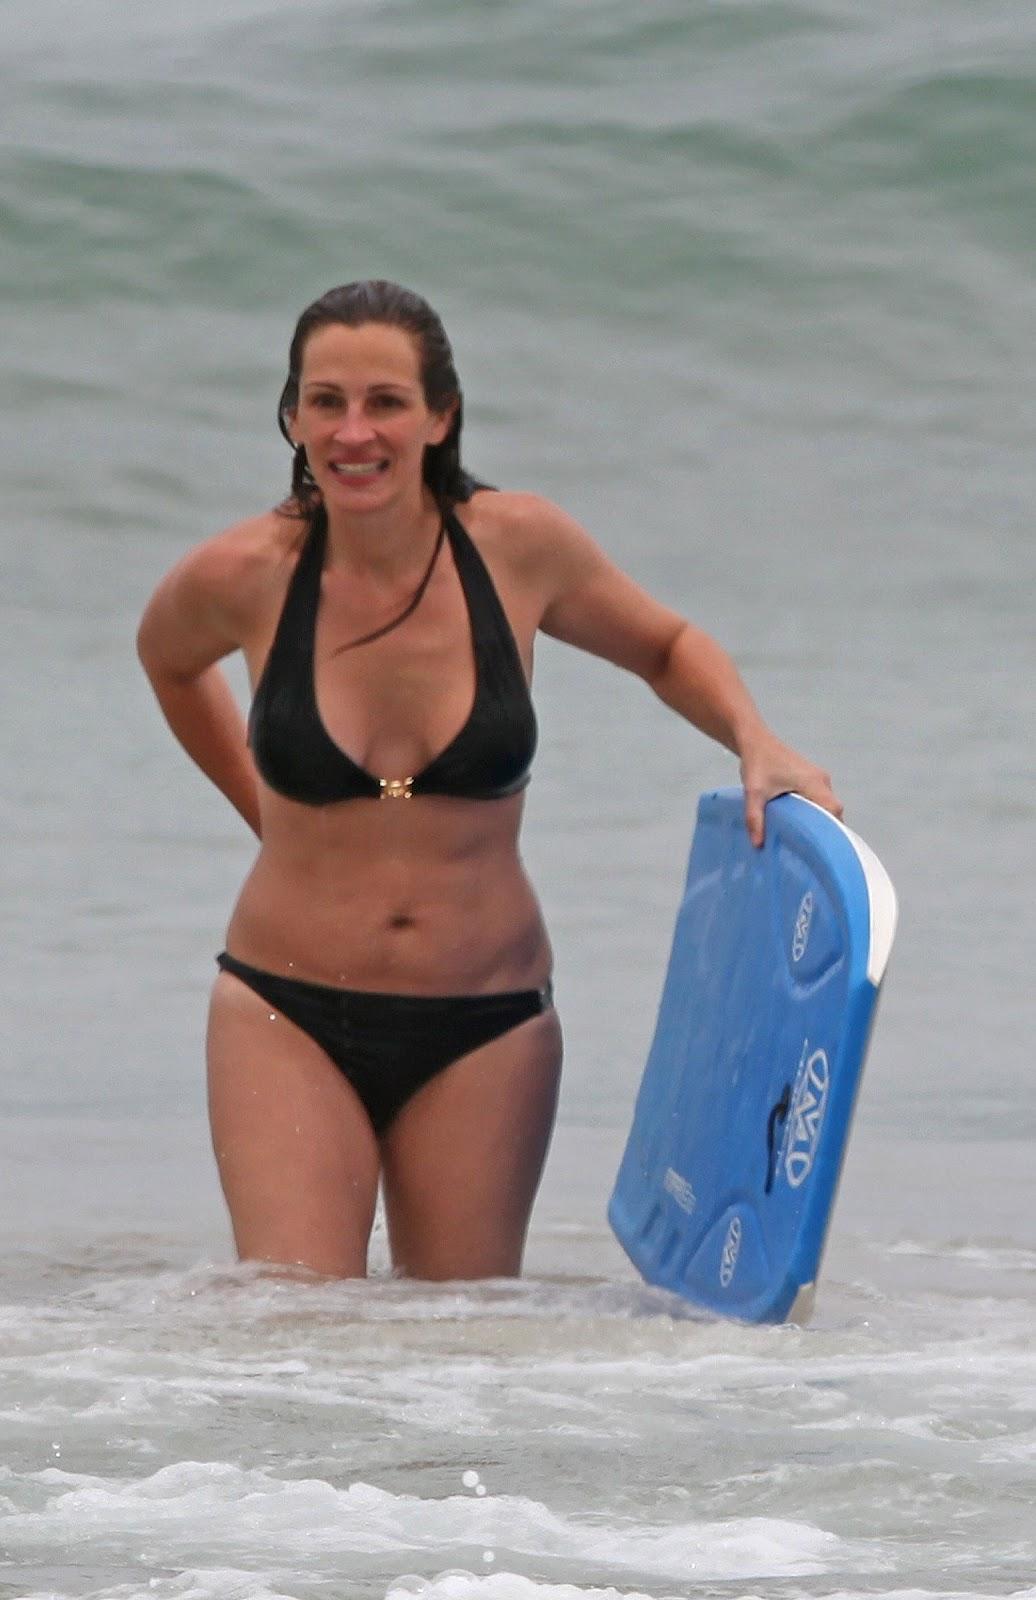 http://4.bp.blogspot.com/-tUKg_b3YIYw/T8DtQzQyYDI/AAAAAAAAHIw/w2aUHk2wiQI/s1600/+Julia+Roberts+-+Bikini+candids+Hawaii+%252819%2529.jpg